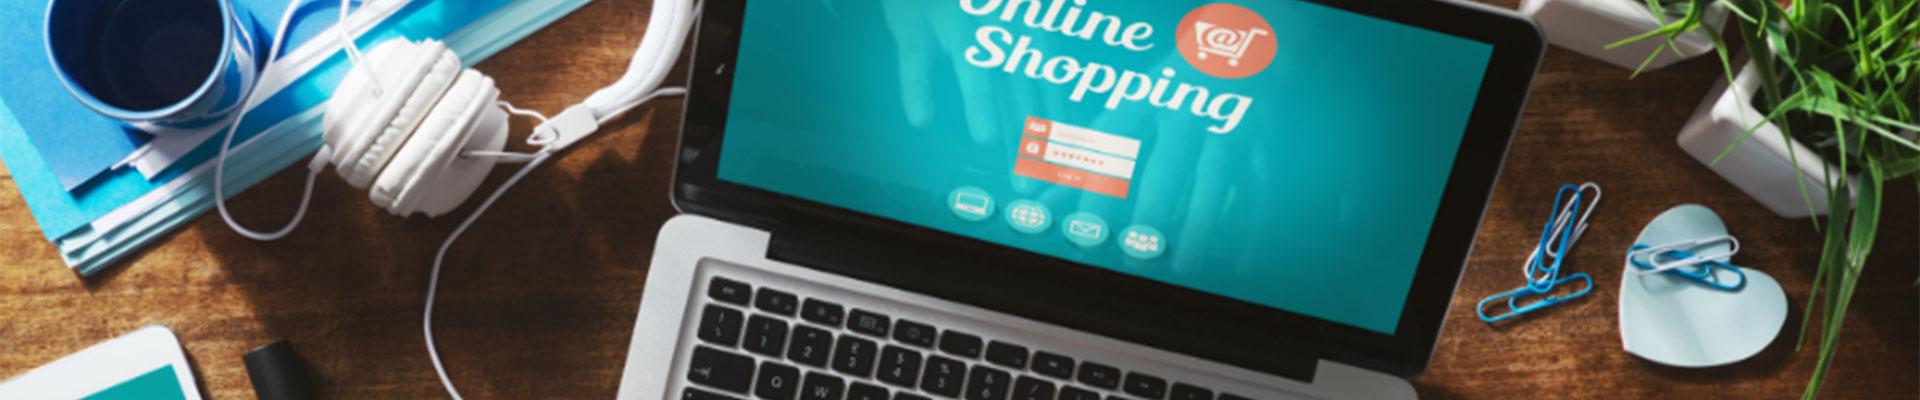 ecommerce-banner-new